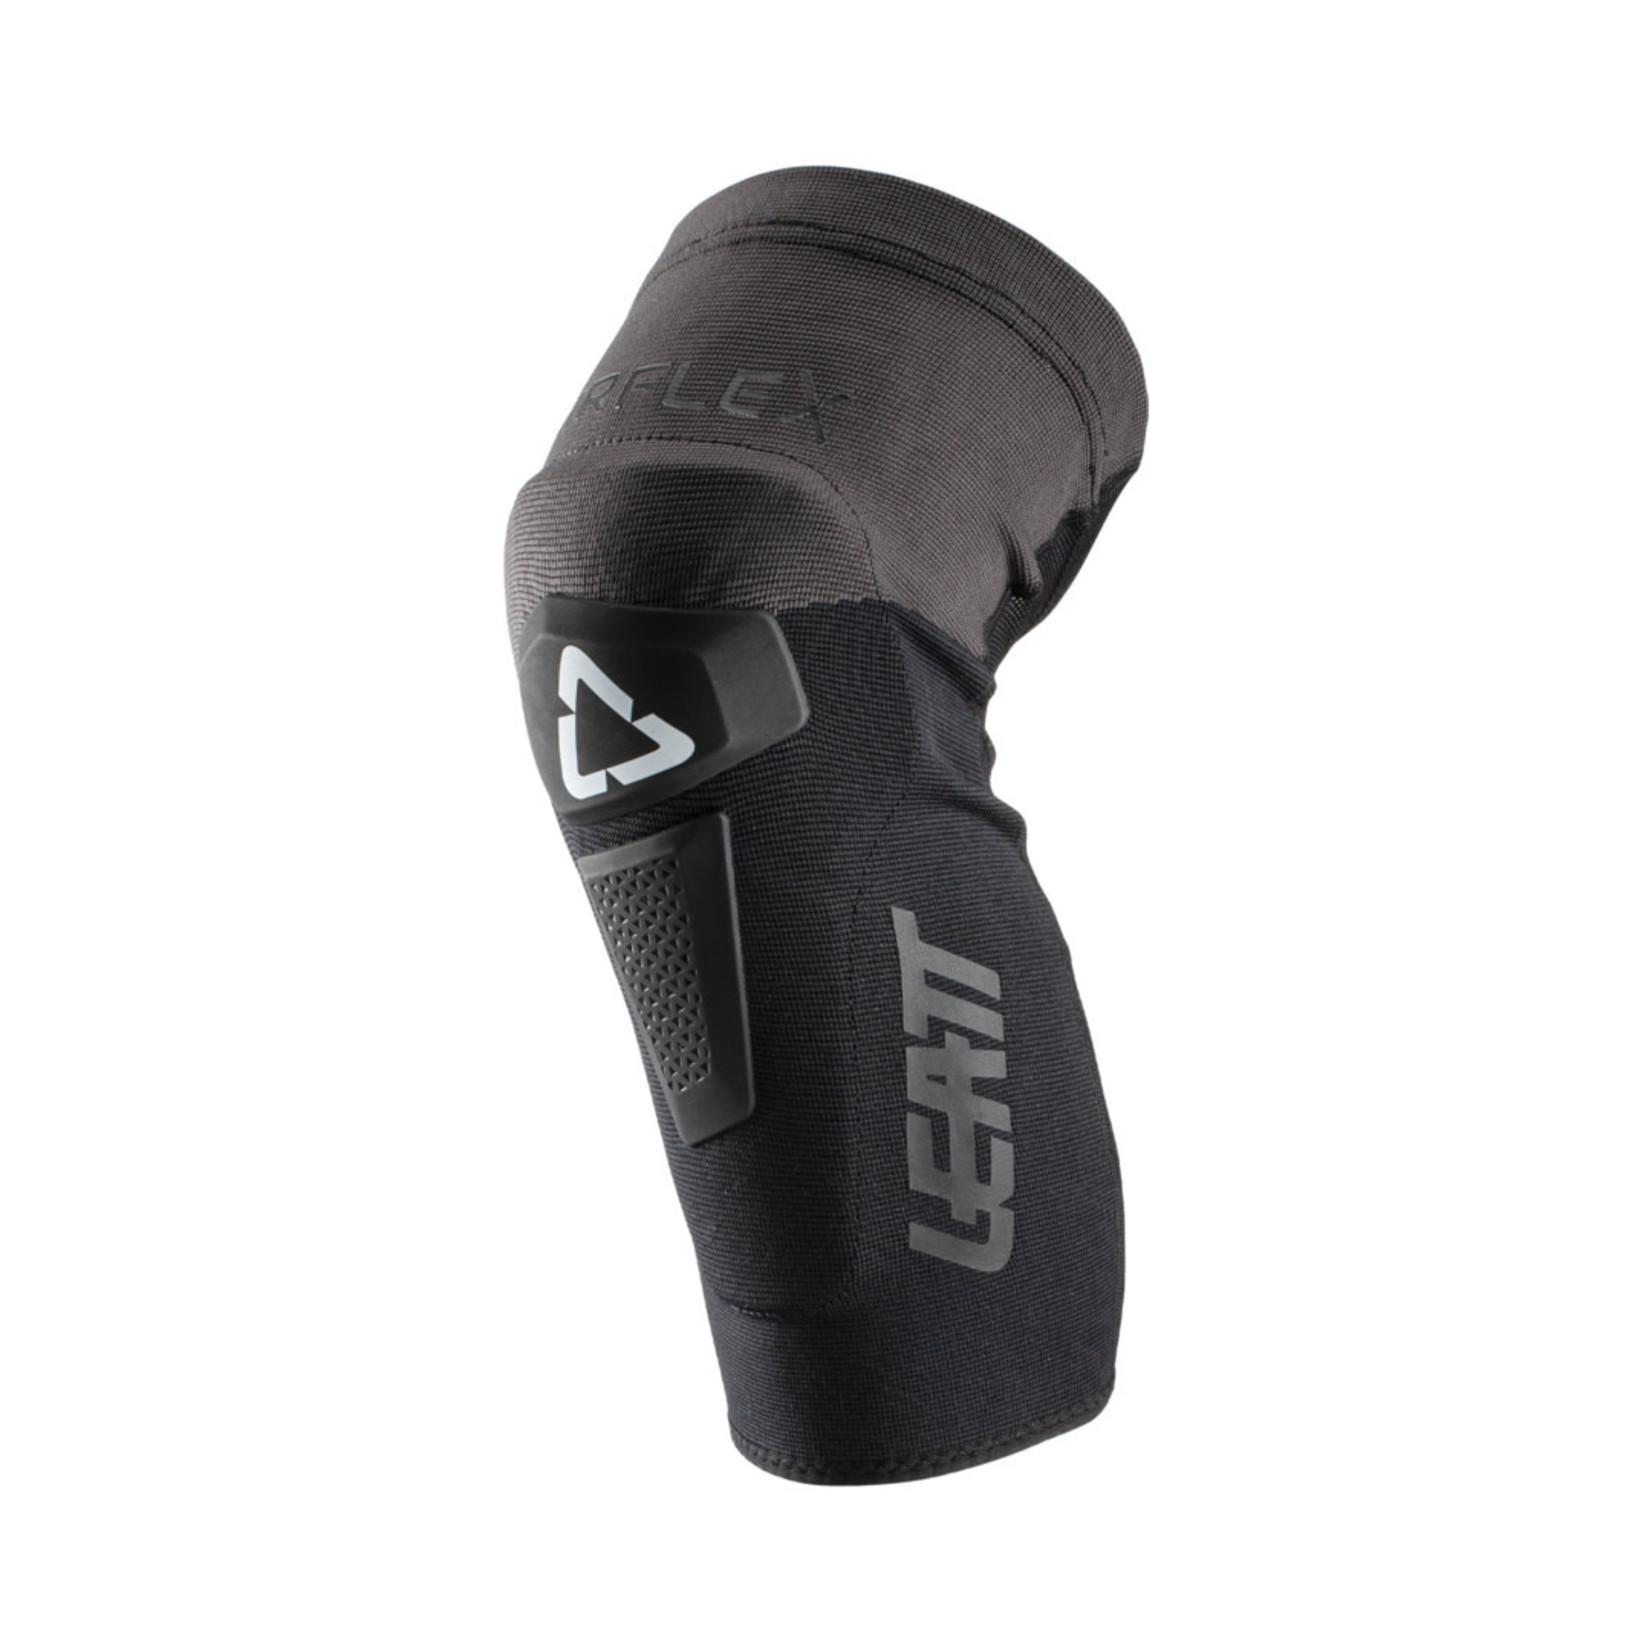 LEATT Leatt - Knieschützer knee guard airflex hybrid L